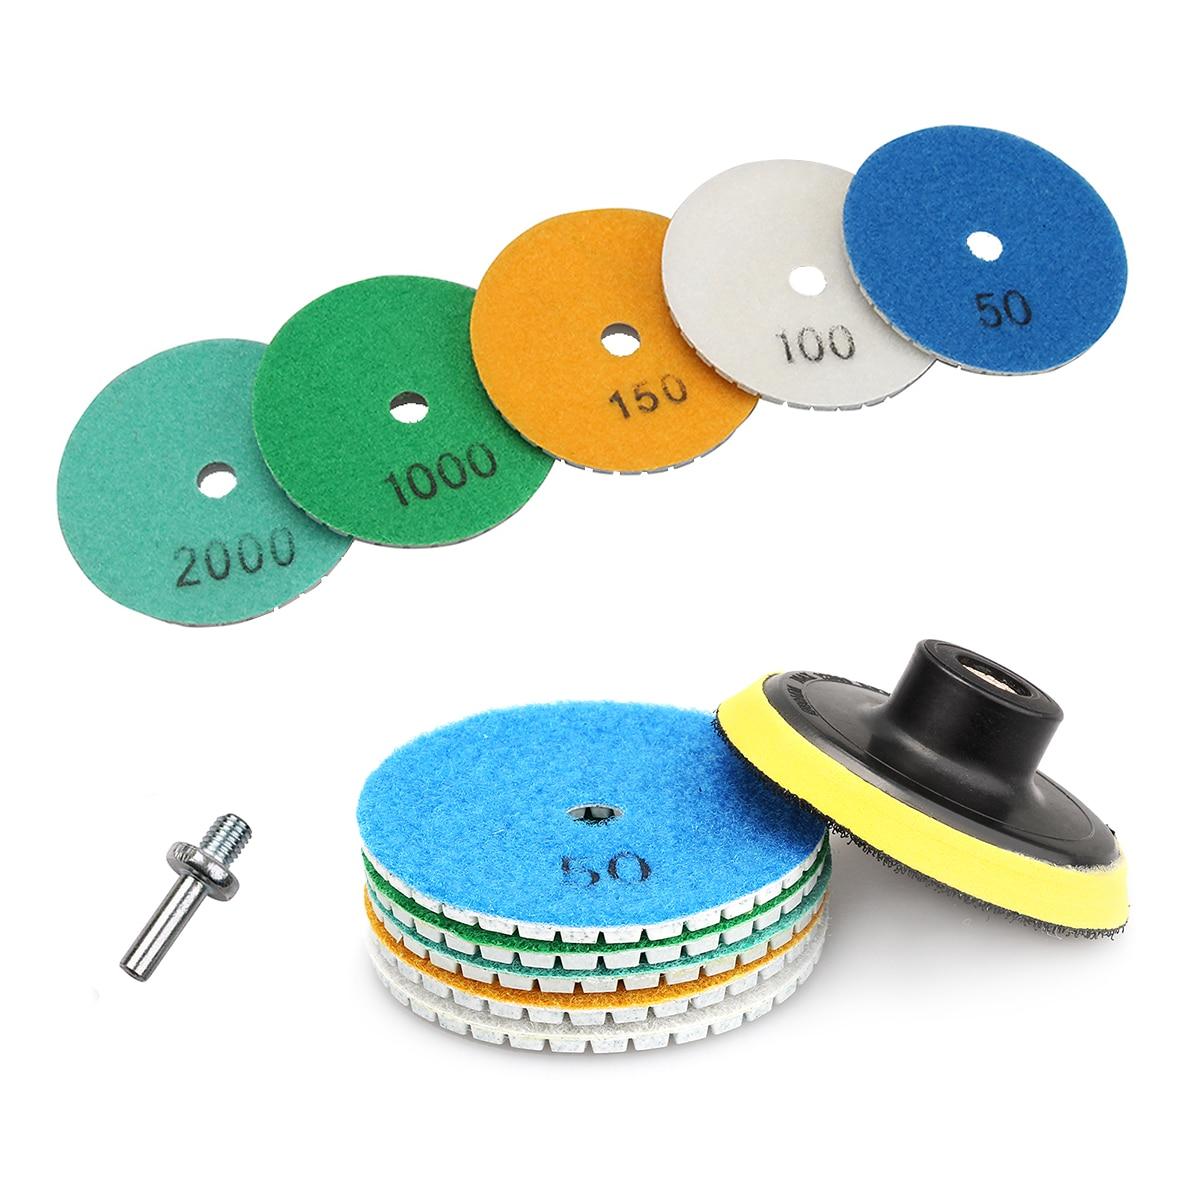 3 Inch Wet Diamond Polishing Pad Grinding Disc For Granite Marble Stone Grinding